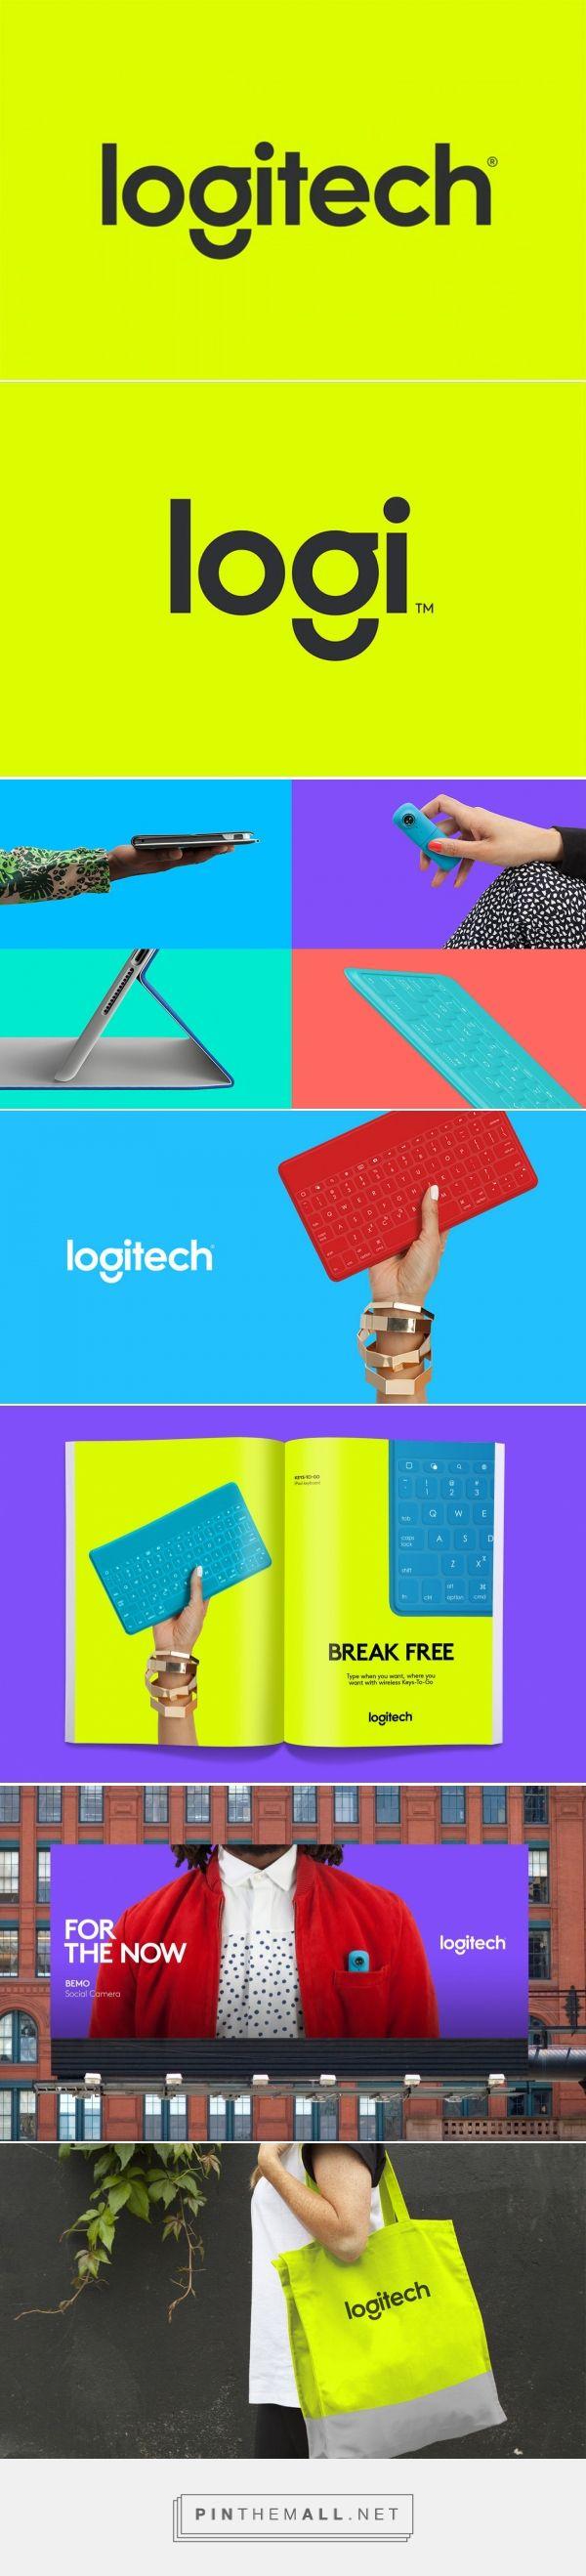 Logitech by DesignStudio